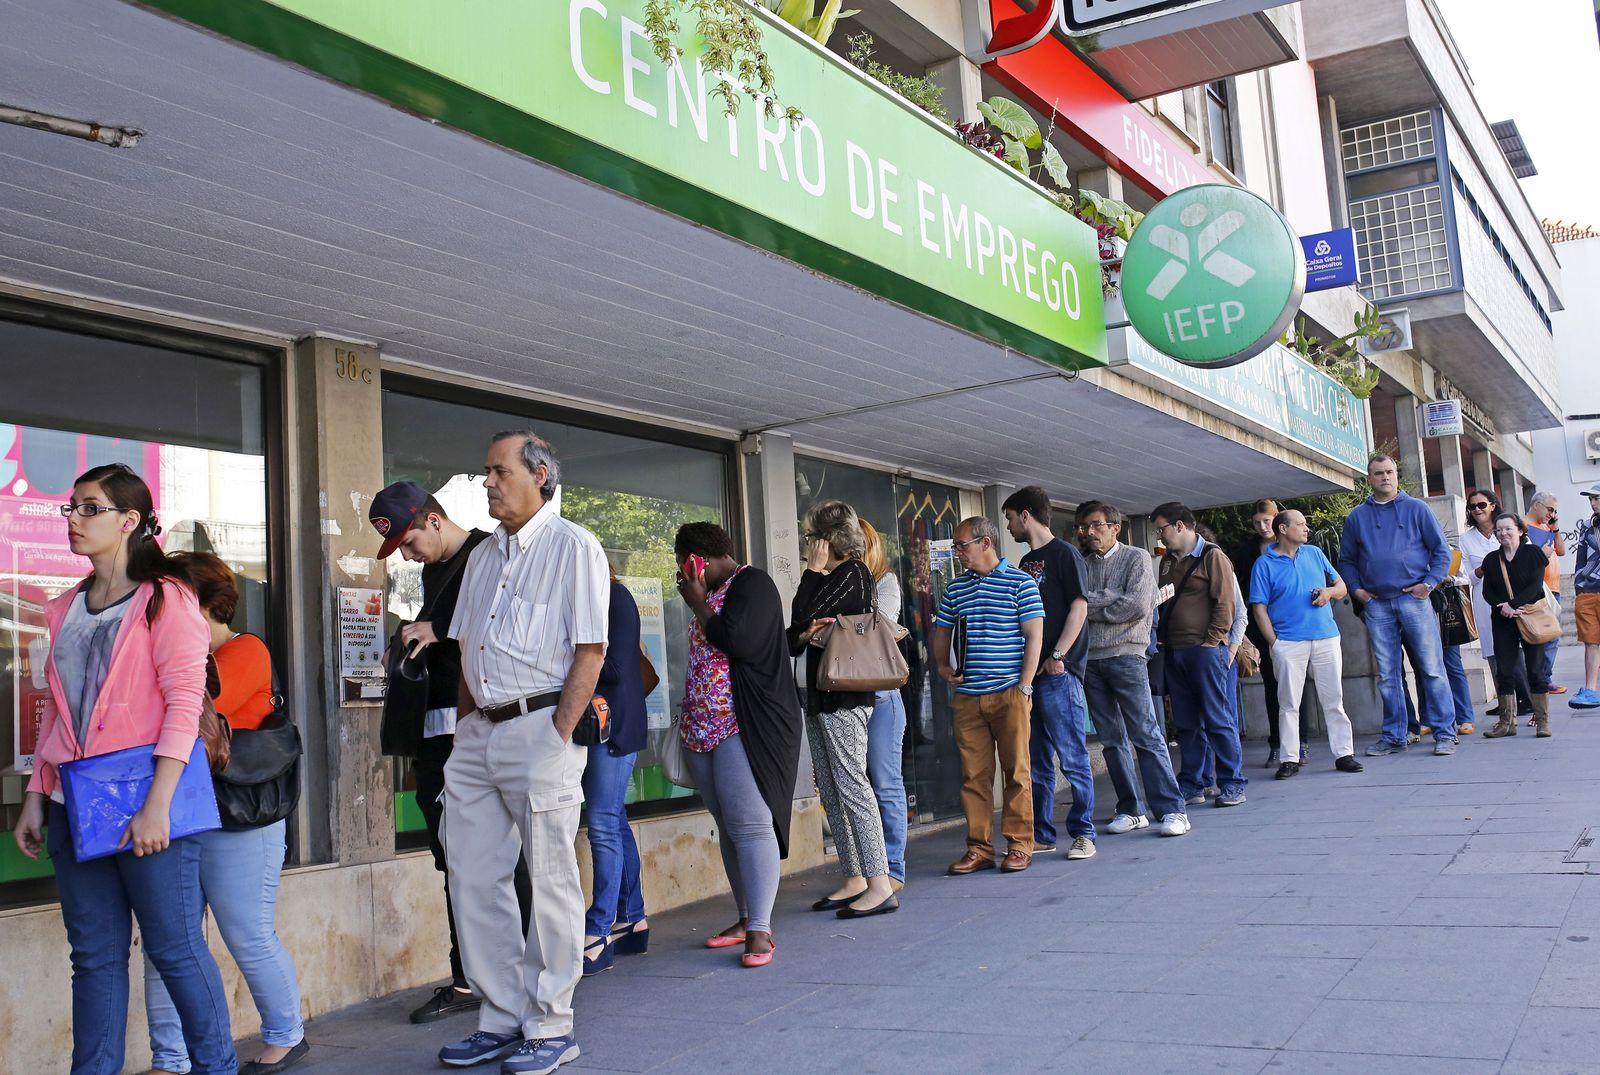 Portugal / Arbeitslosigkeit / Arbeitslos / Konjunktur